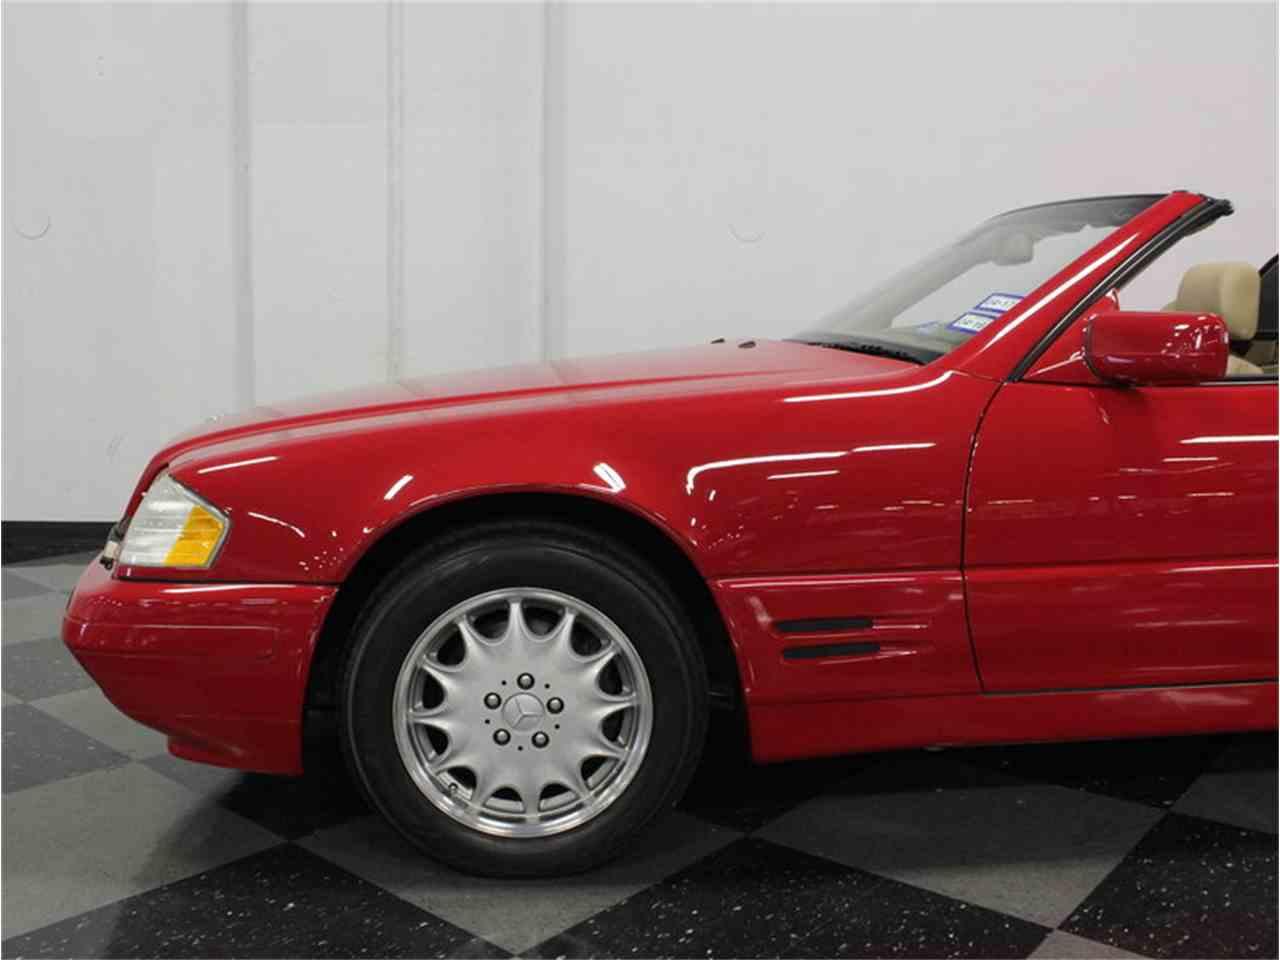 1998 mercedes benz sl500 for sale cc for Fort worth mercedes benz dealership